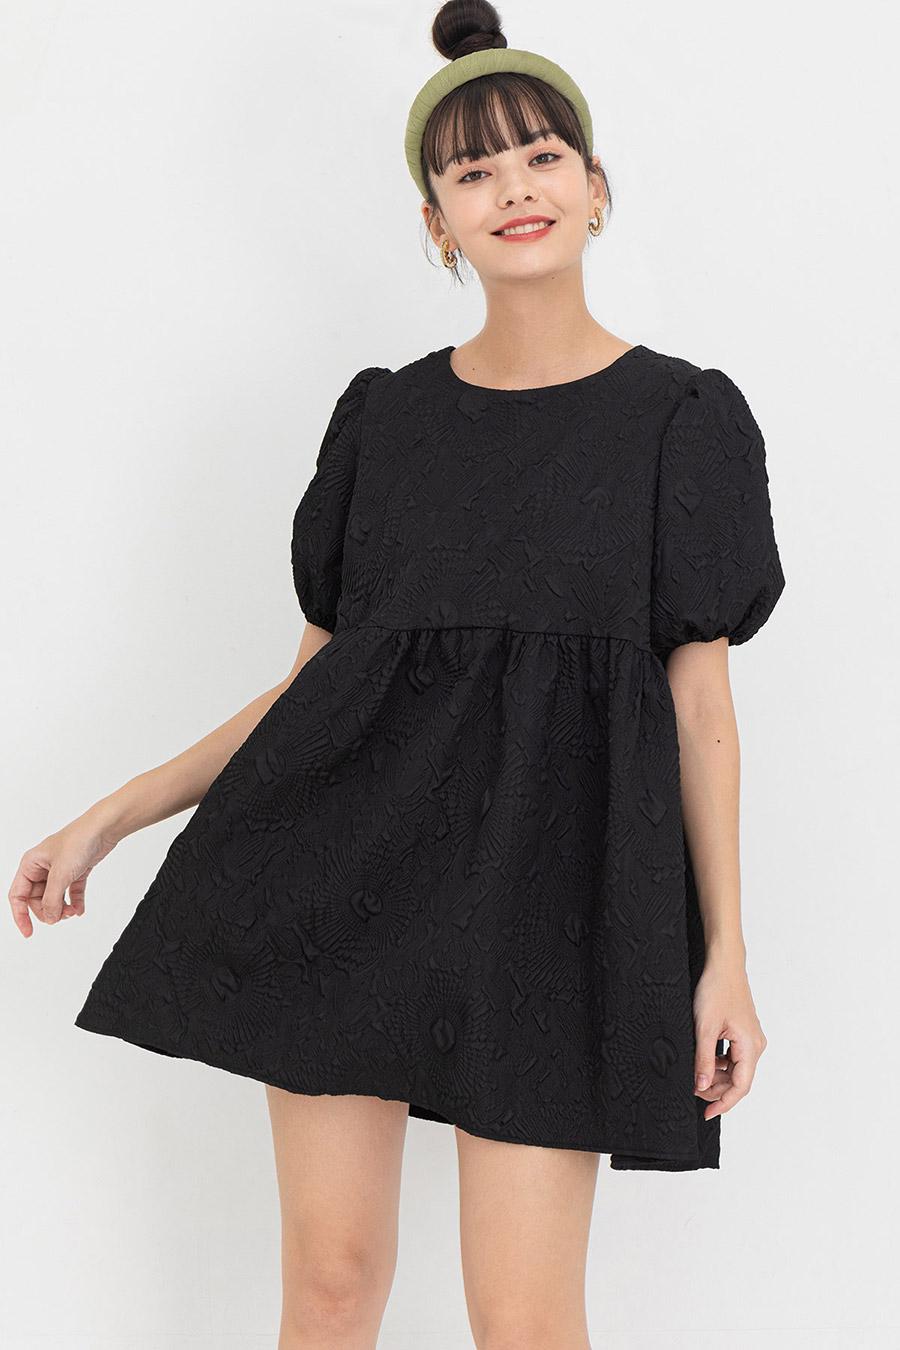 *BO* SIBLEY DRESS - NOIR